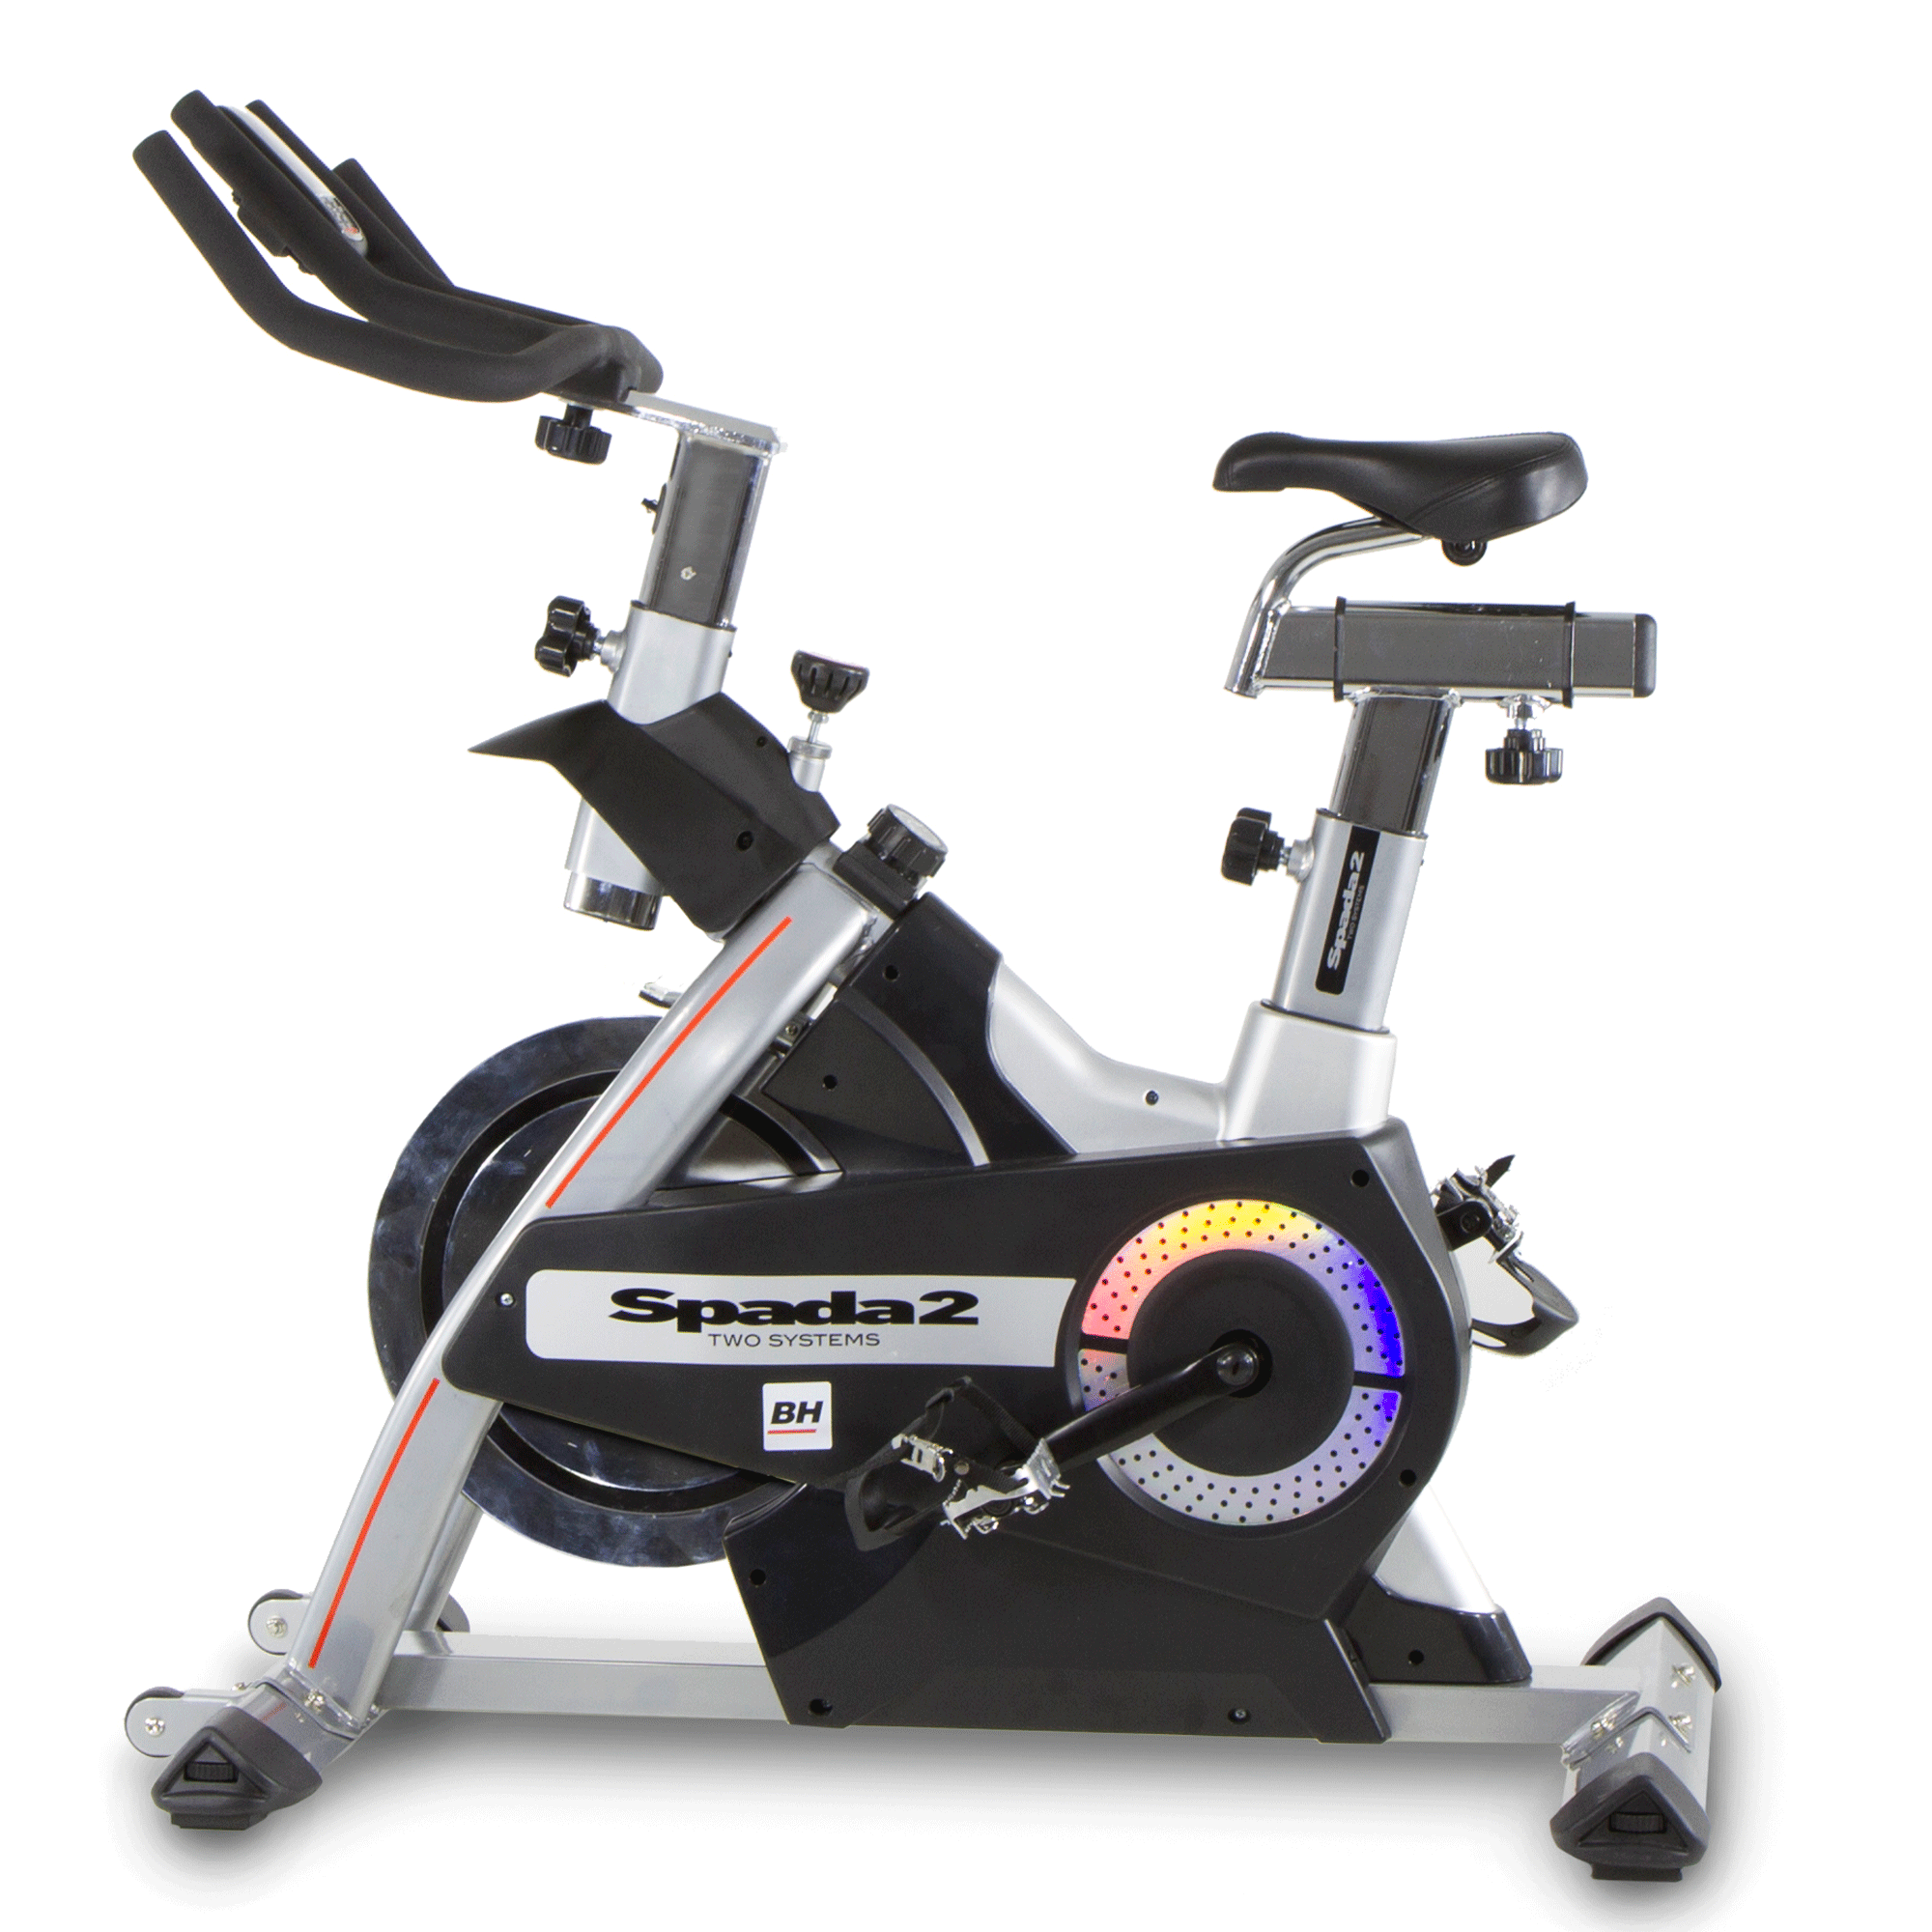 Bh fitness X-SPADA II